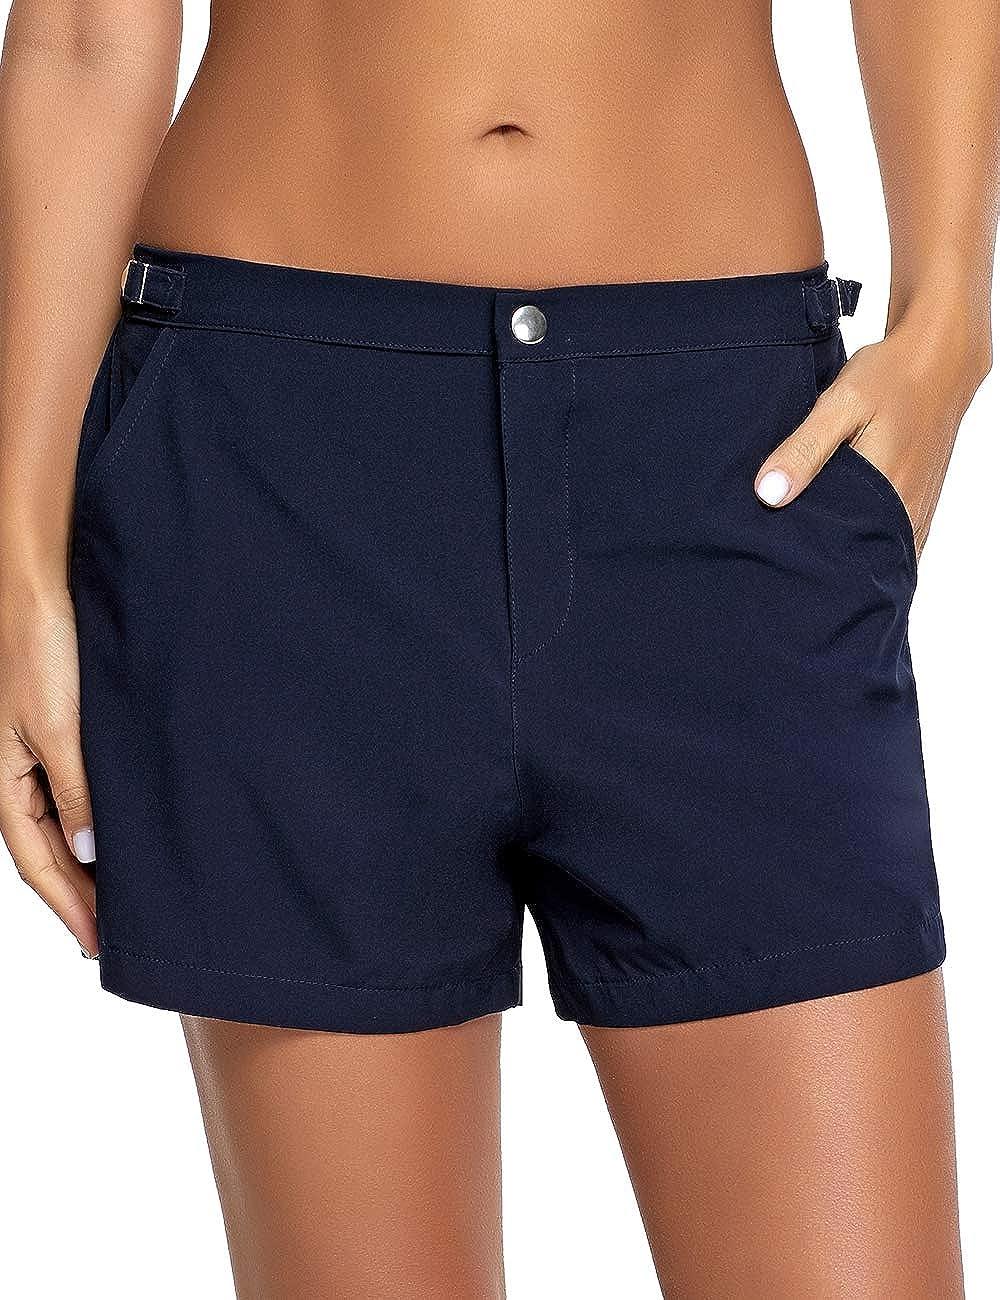 Utyful Womens Casual Lace Up Elastic Waist Swimsuit Bottom Beach Board Shorts